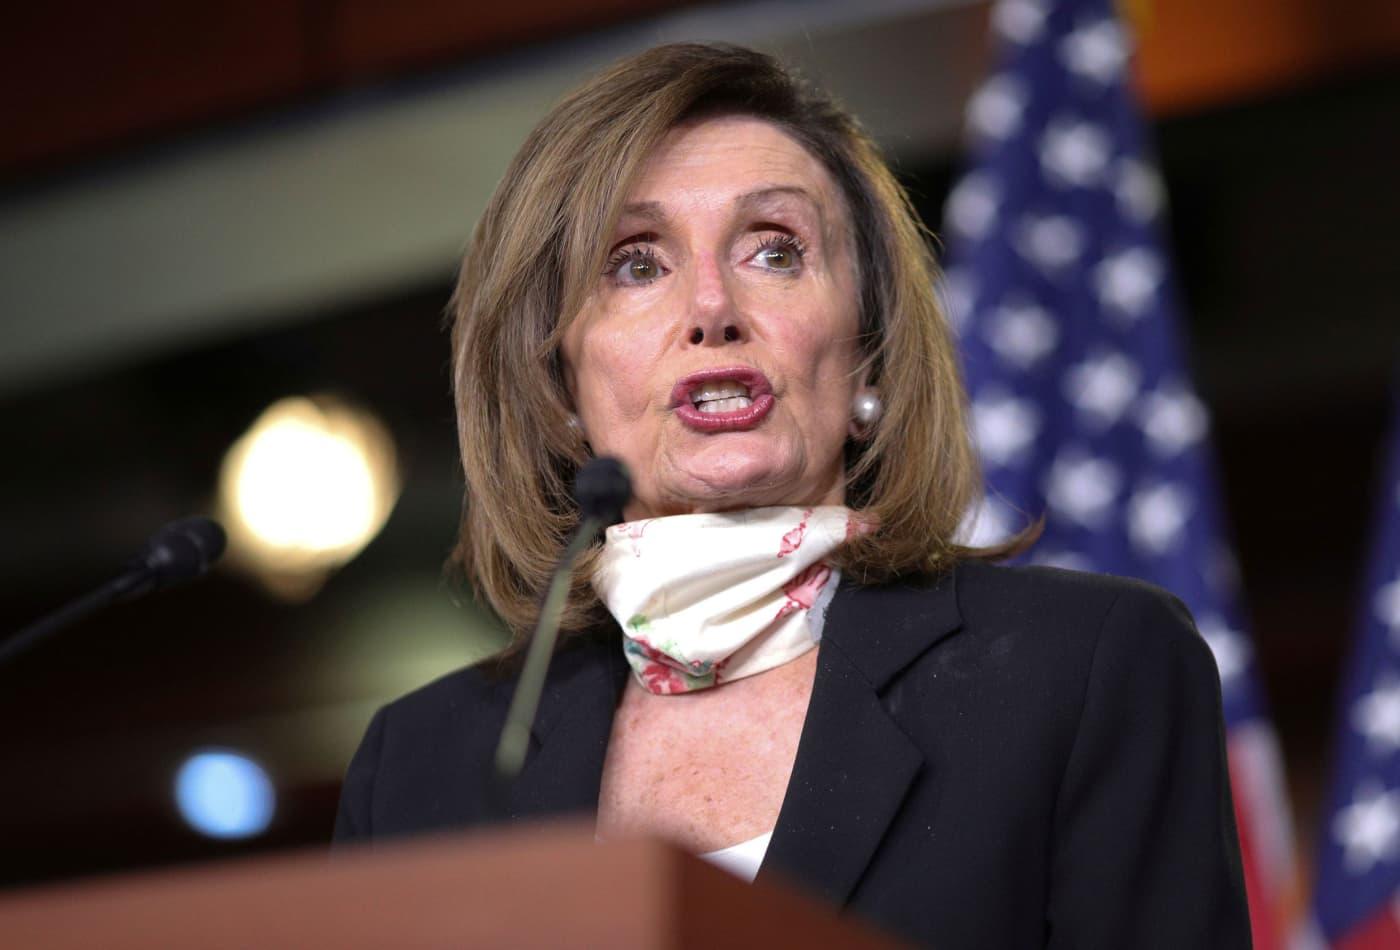 Democrats plan to introduce police reform bill on Monday, Nancy Pelosi says